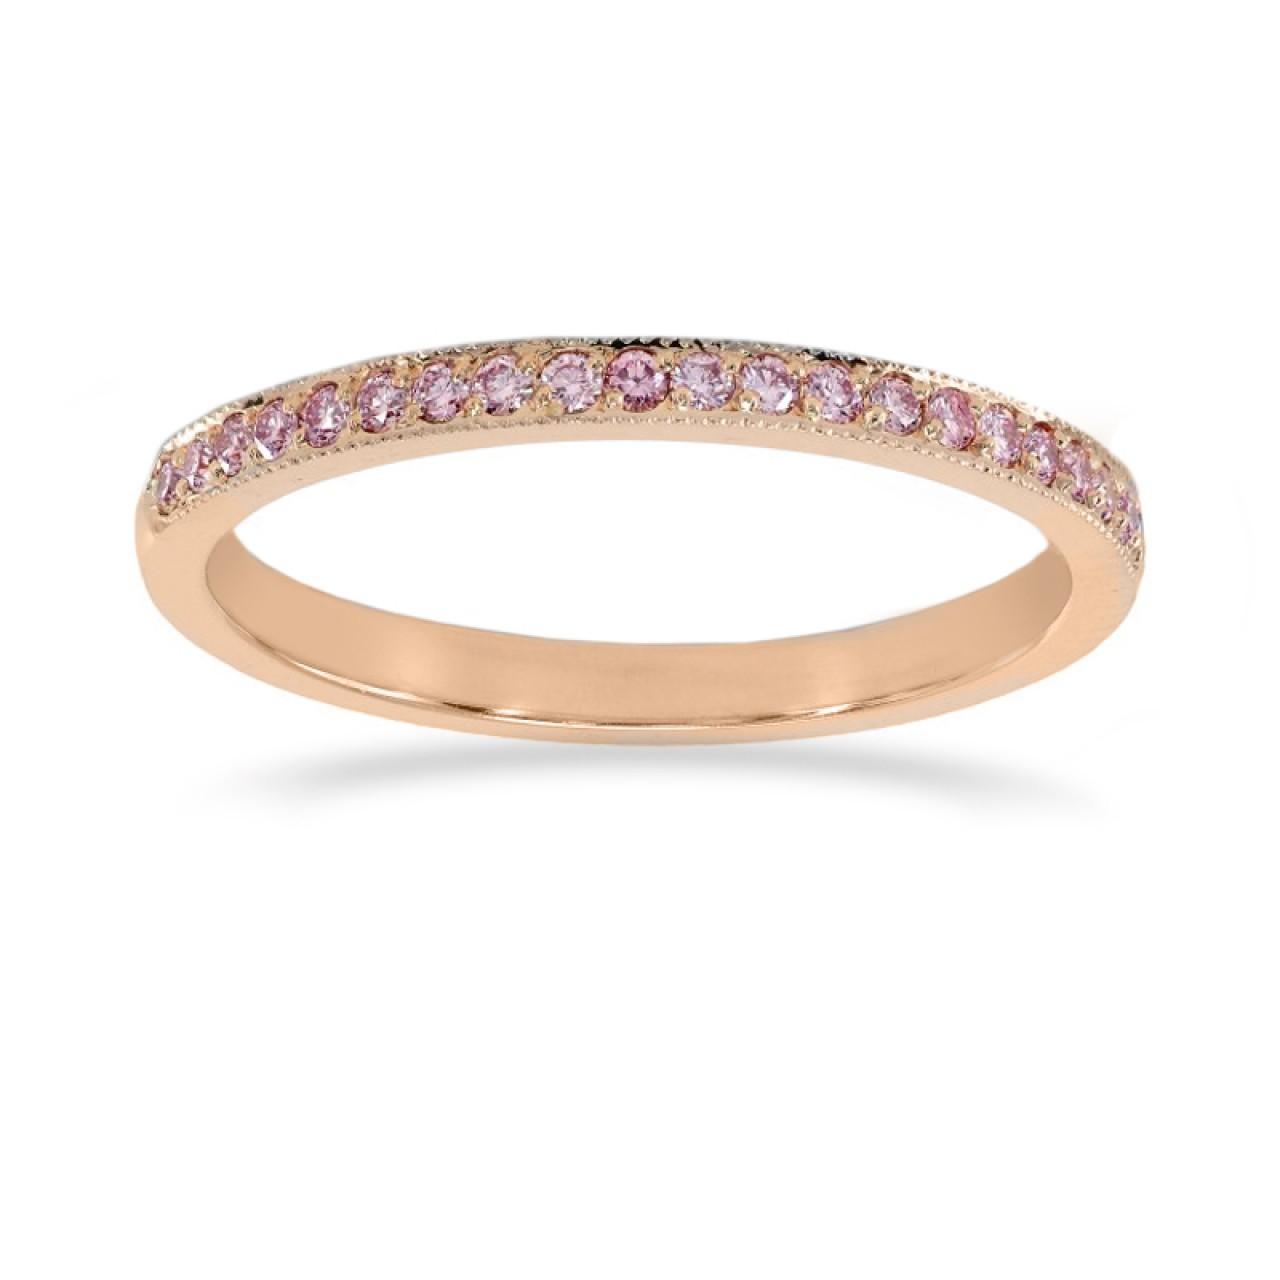 Fancy Light Pink Diamond Eternity Band